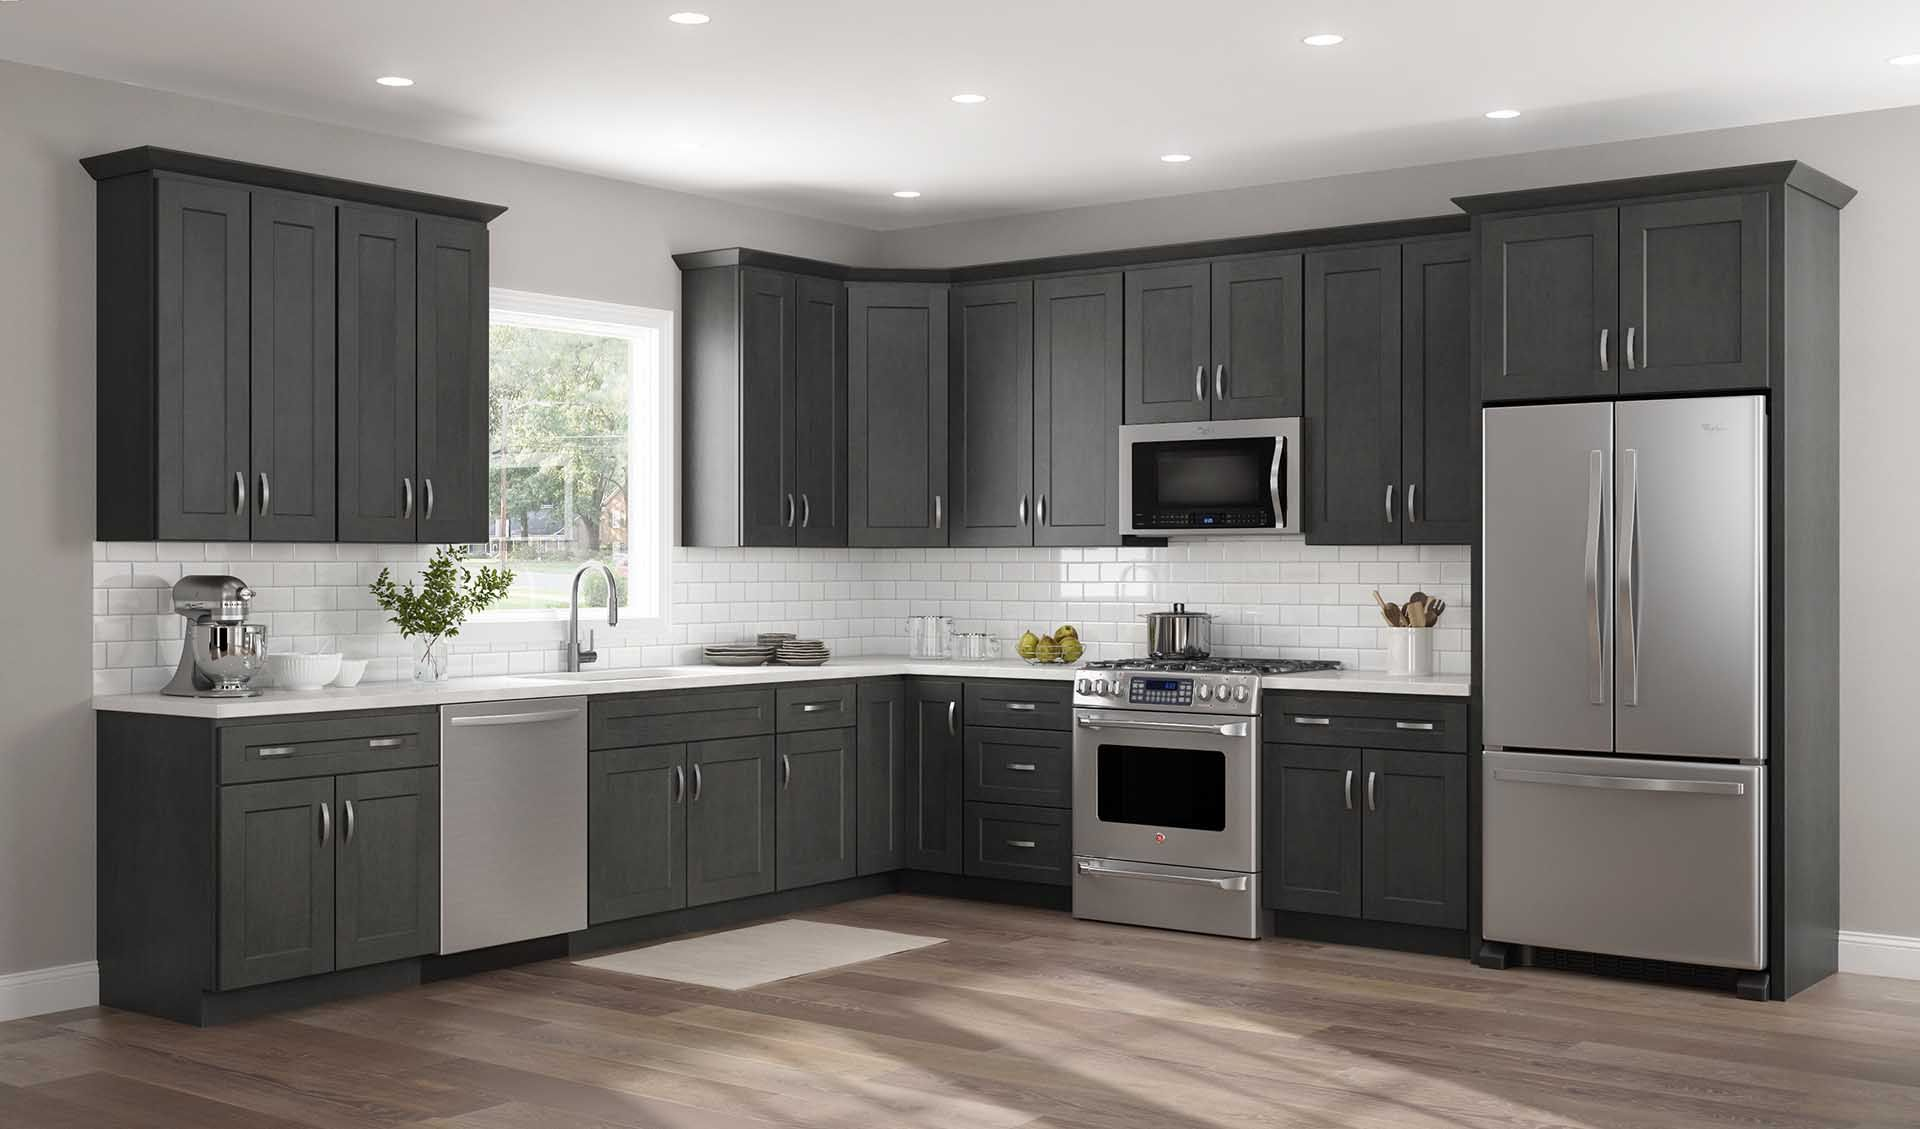 Kitchen Cabinets Kountry Cabinets Home Furnishings Home Depot Kitchen Slate Appliances Kitchen Slate Kitchen